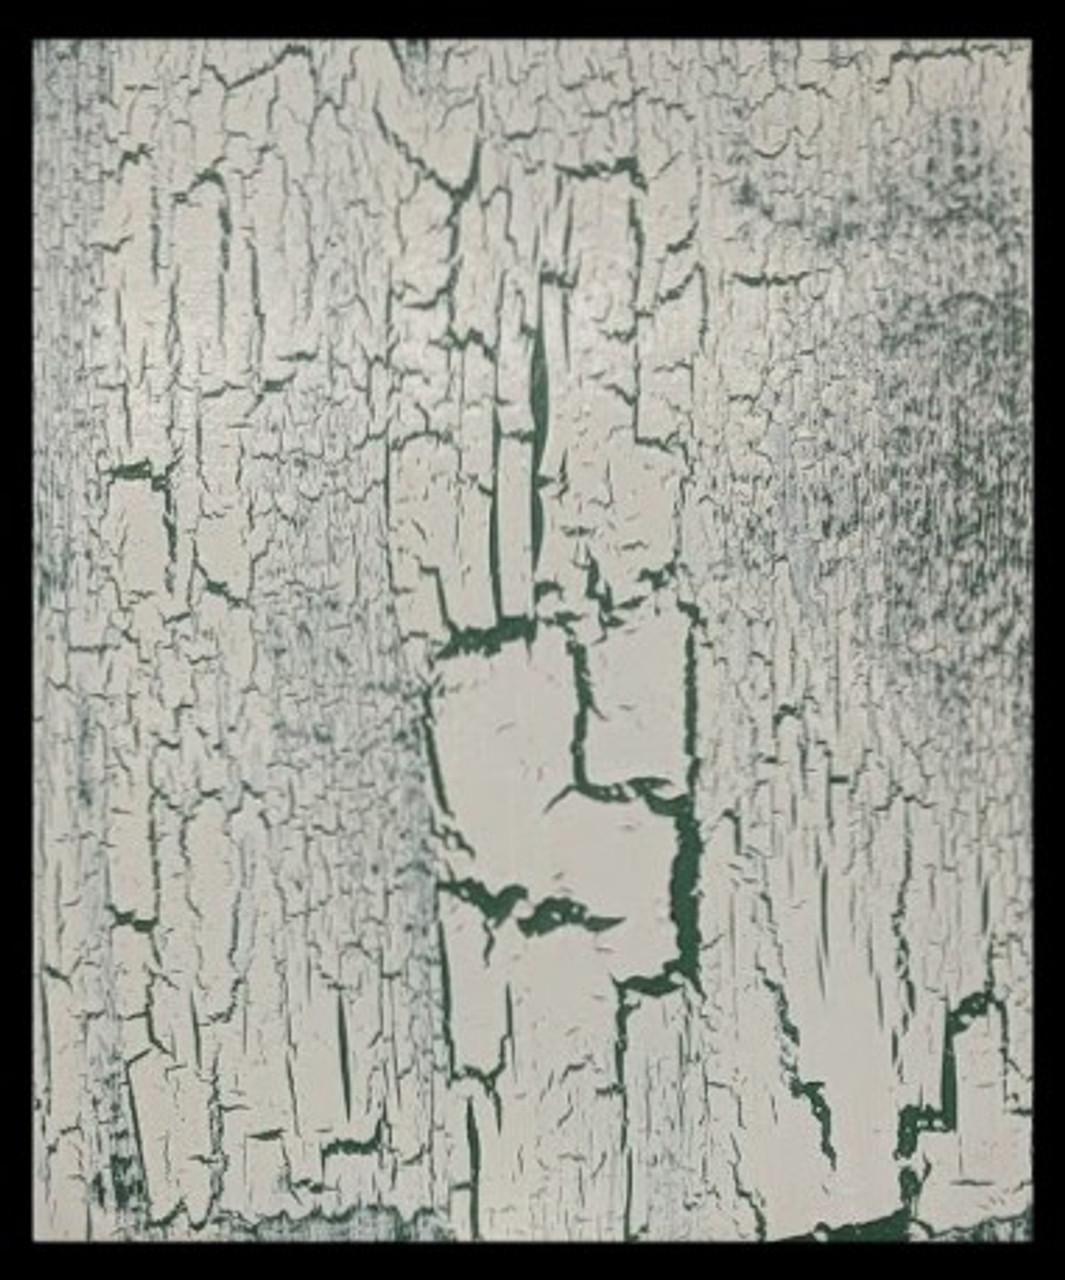 2 coats Green Base Paint,  1 Isolation coat ( PV Decorators Varnish Satin) 1 coat Polyvine Crackle Glaze 1 coat Cream Topcoat Protective Coat (PV Decorators Varnish Satin)